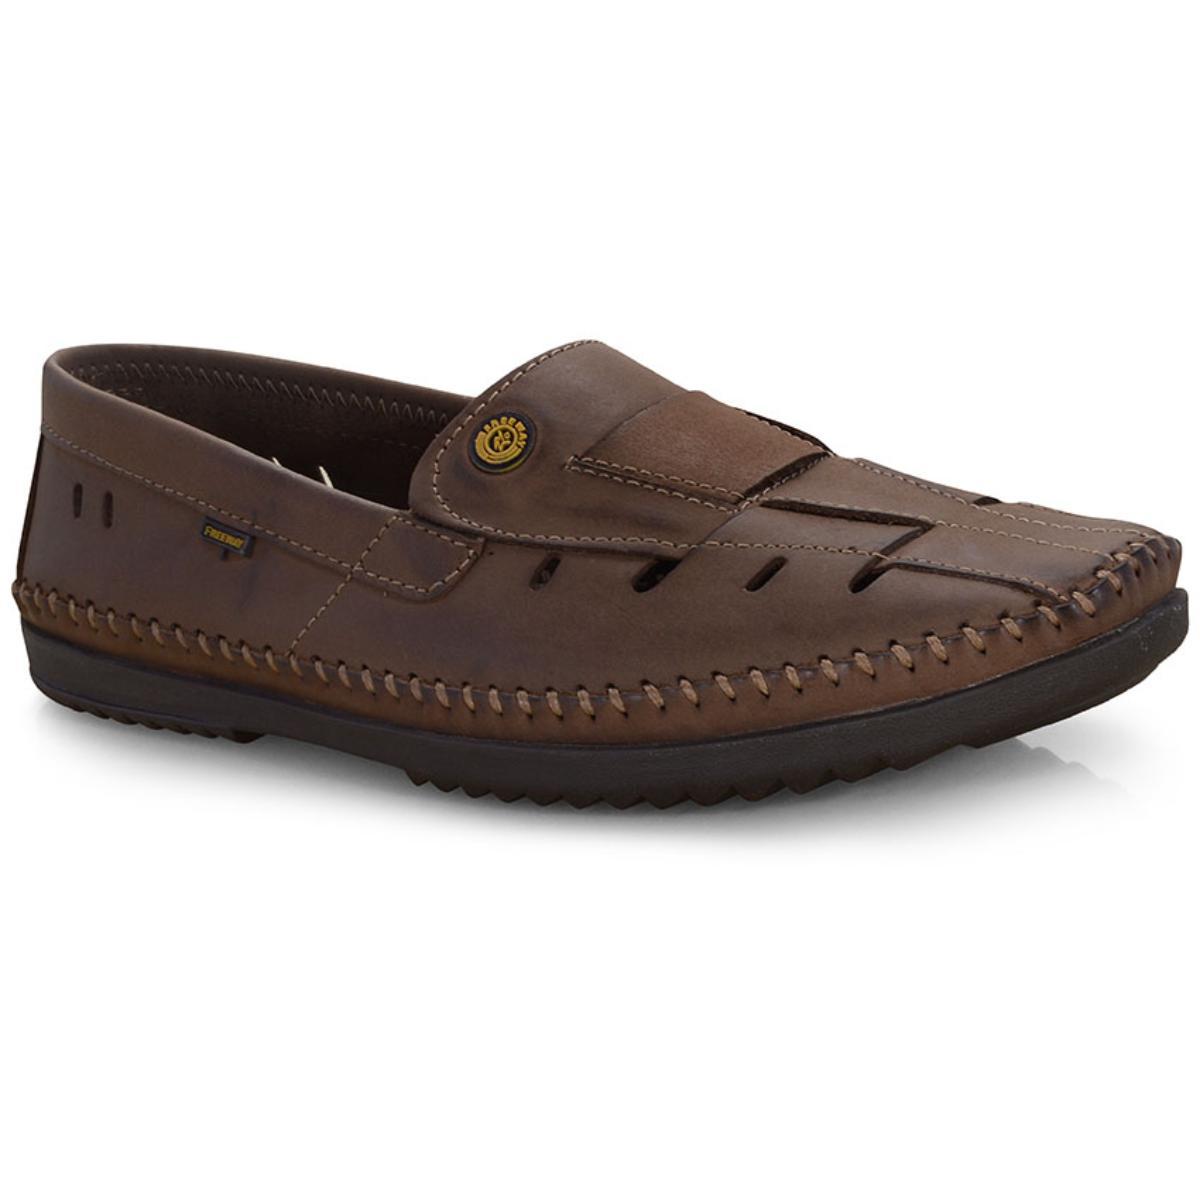 Sapato Masculino Free Way Logan-2 Wax Sesamo